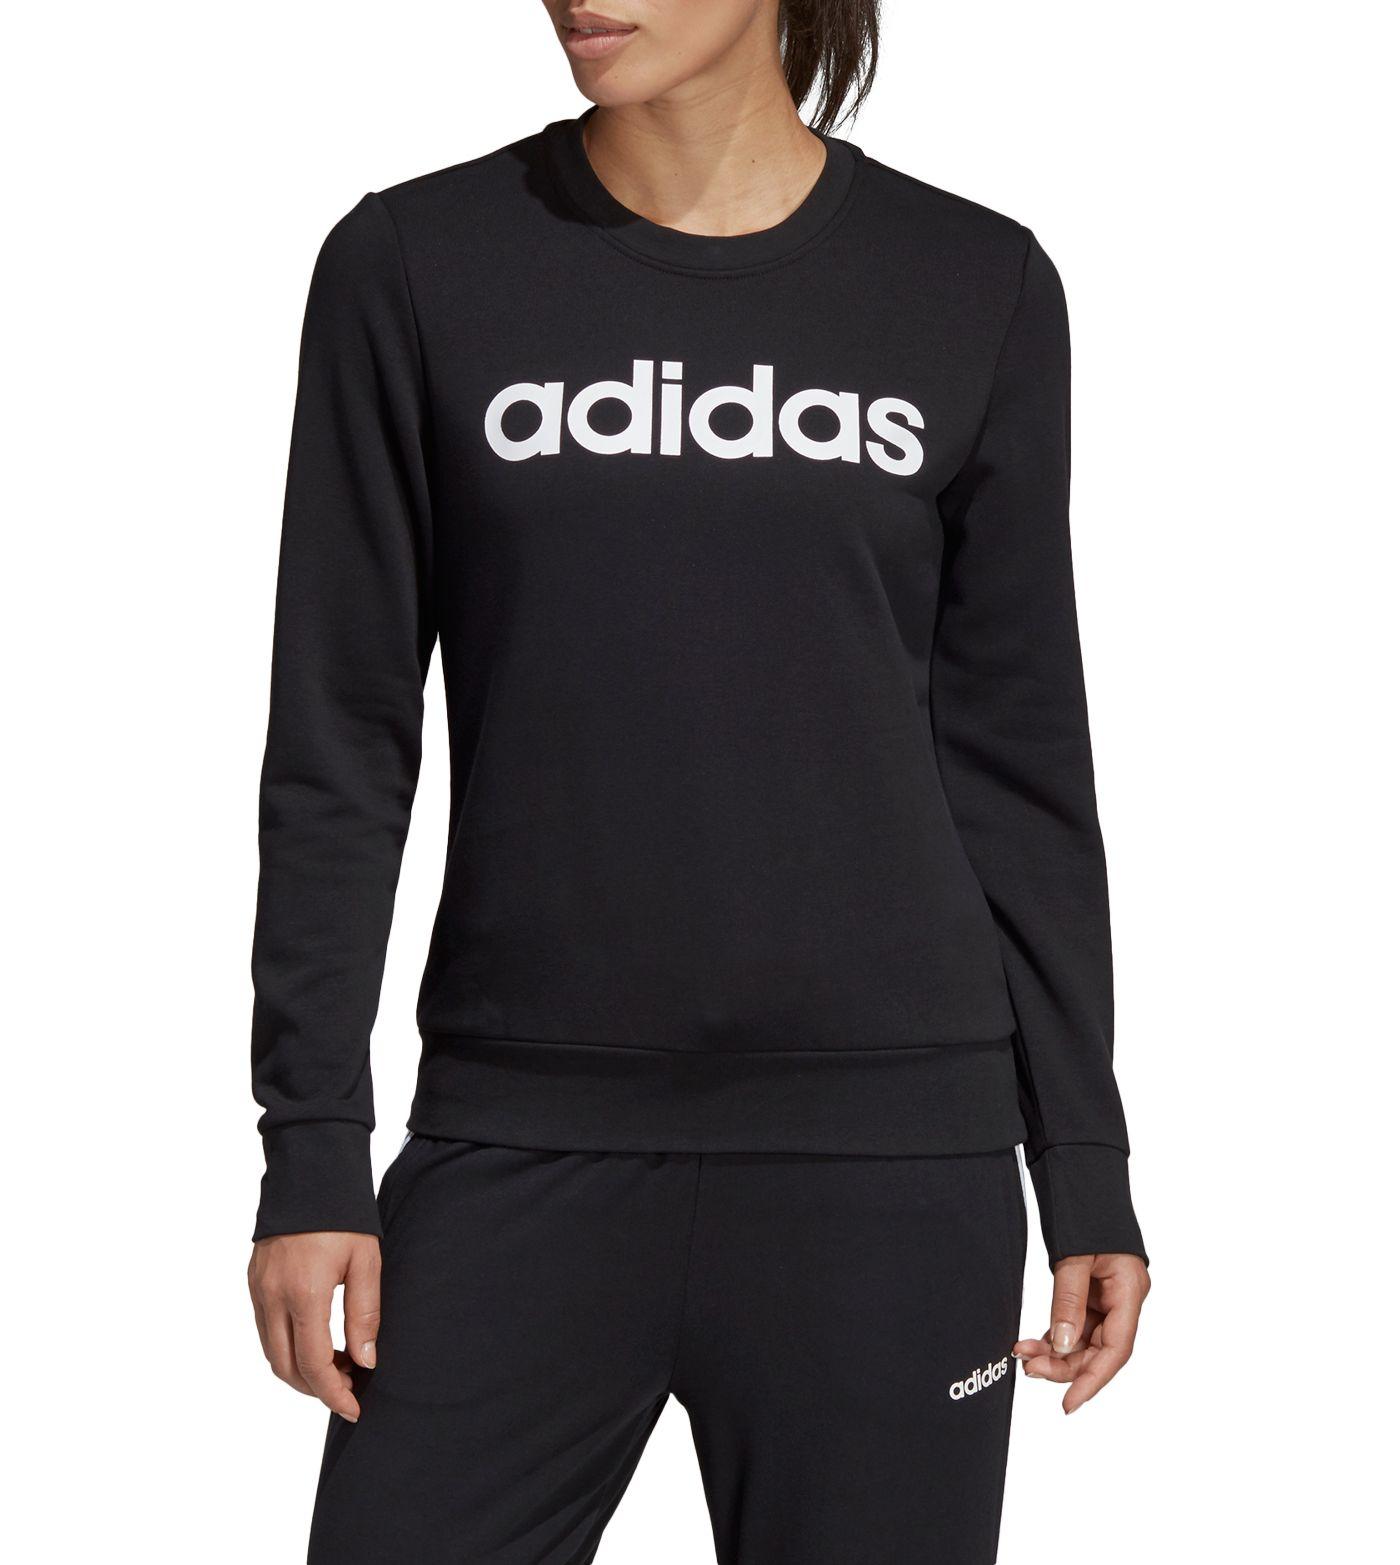 adidas Women's Essentials Linear Crew Neck Sweatshirt